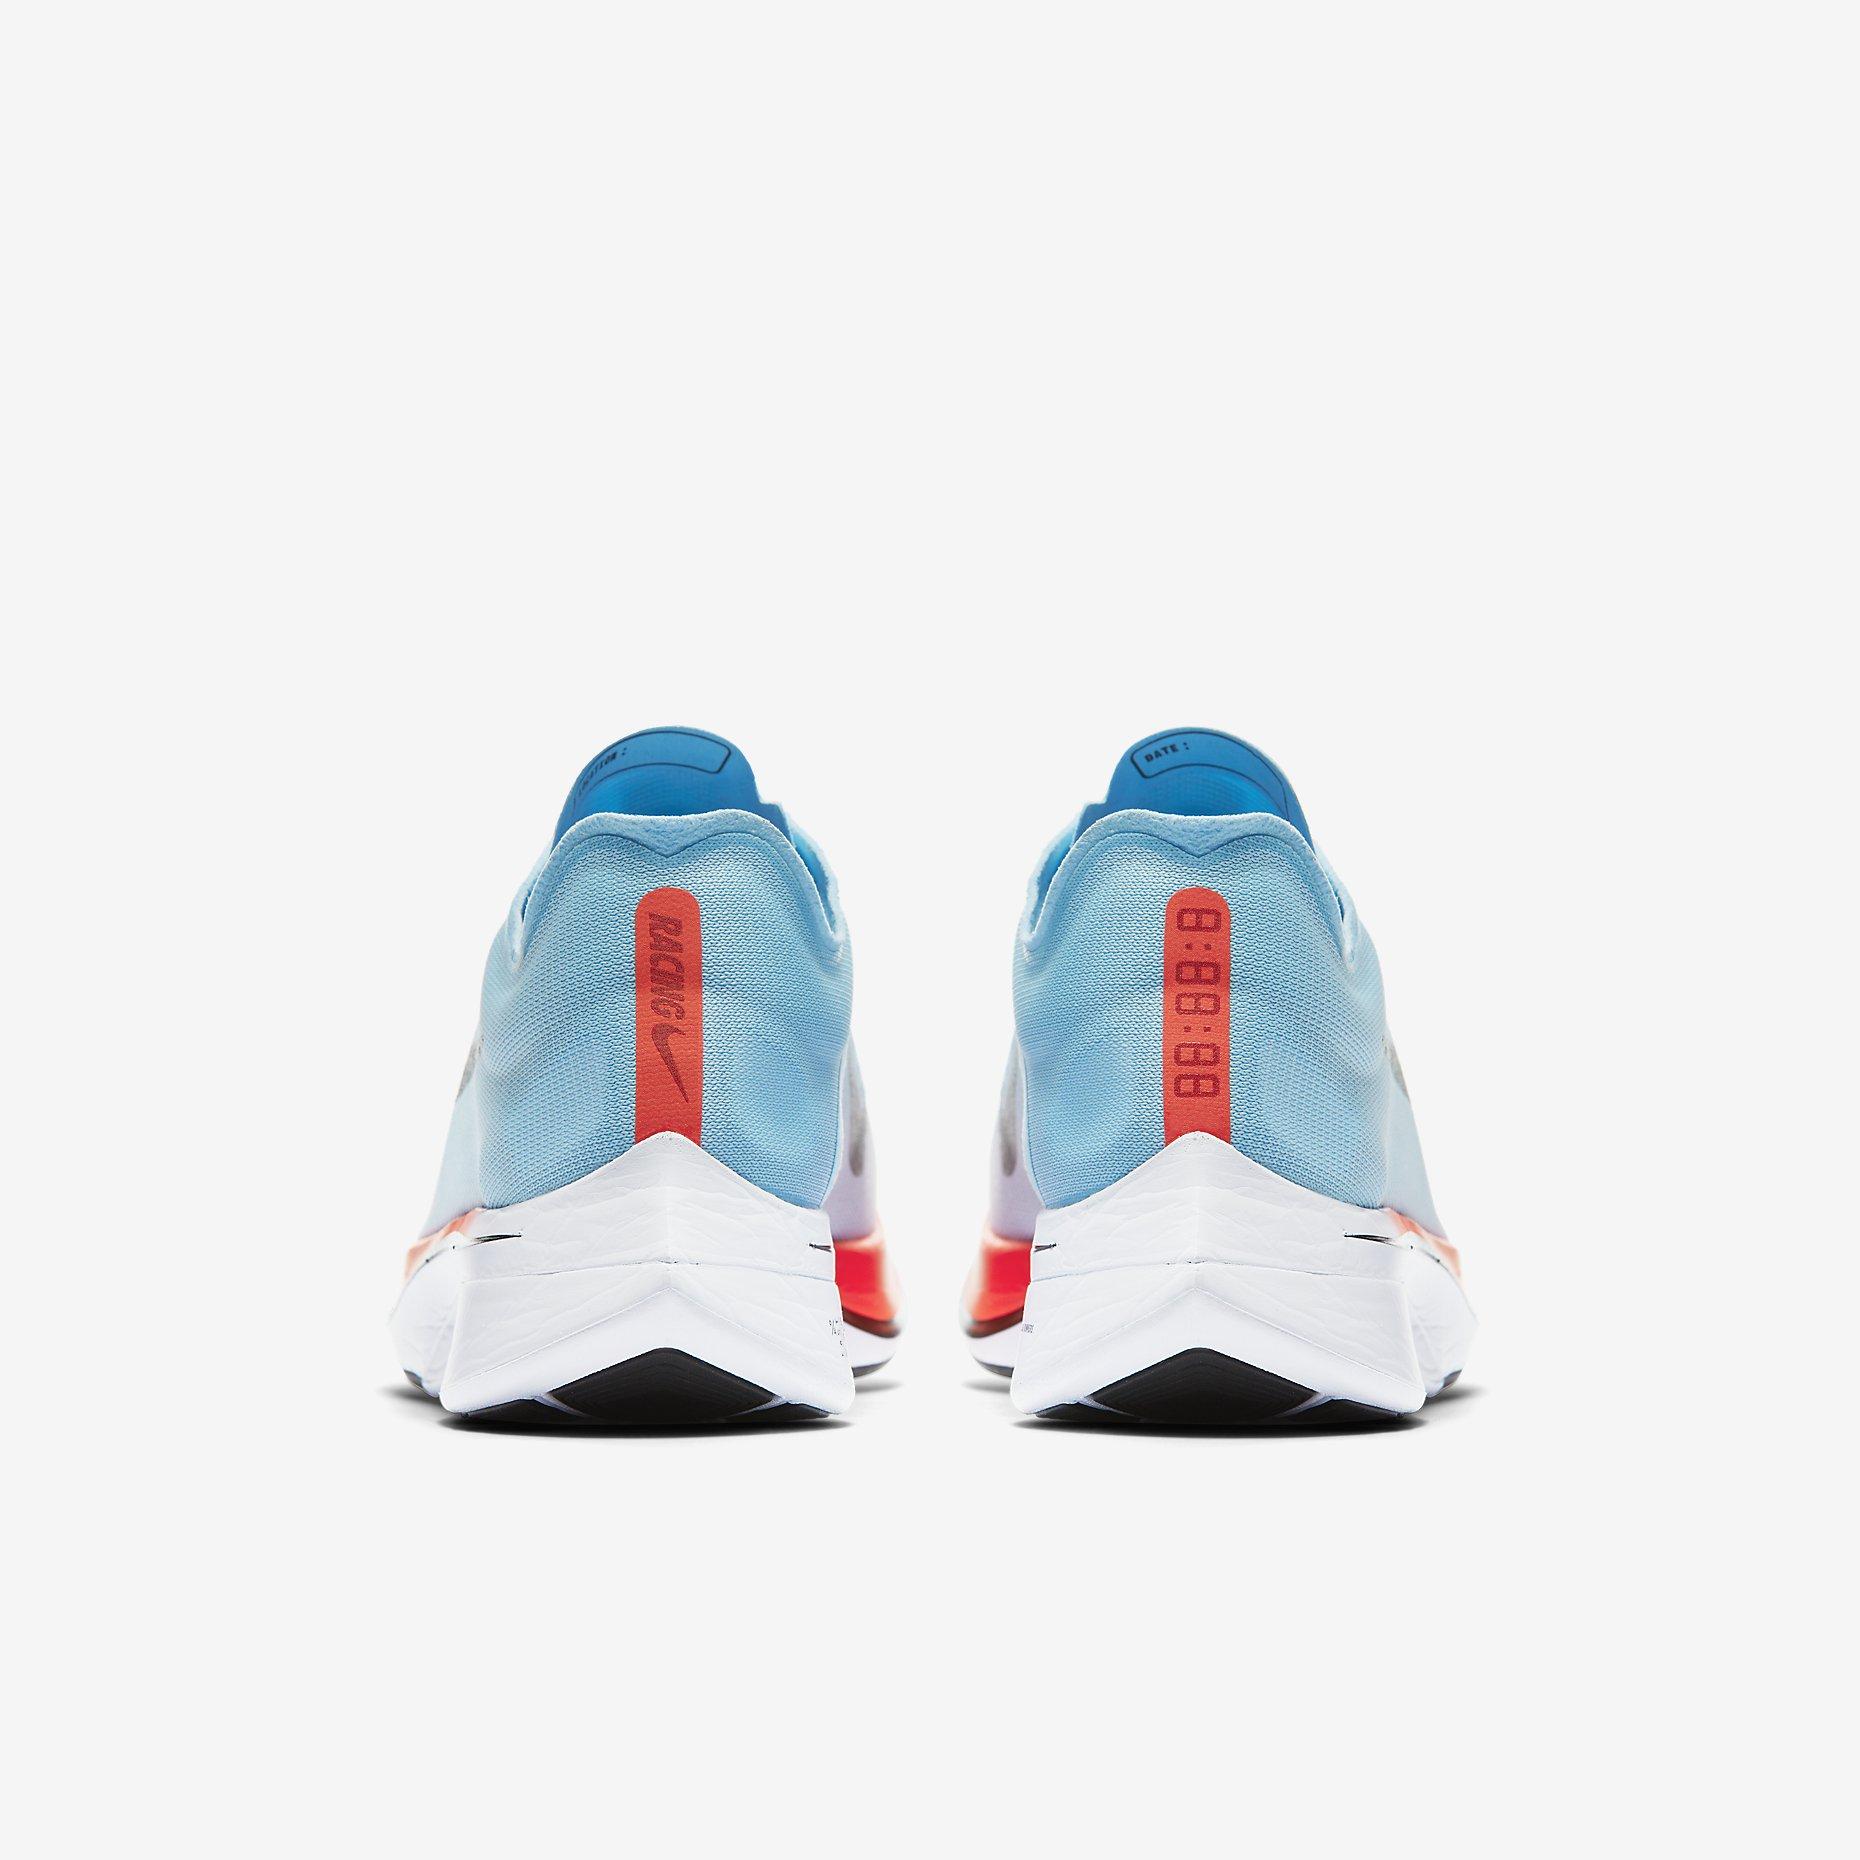 Nike Zoom Vaporfly 4 percent Ice Blue 880847 401 2